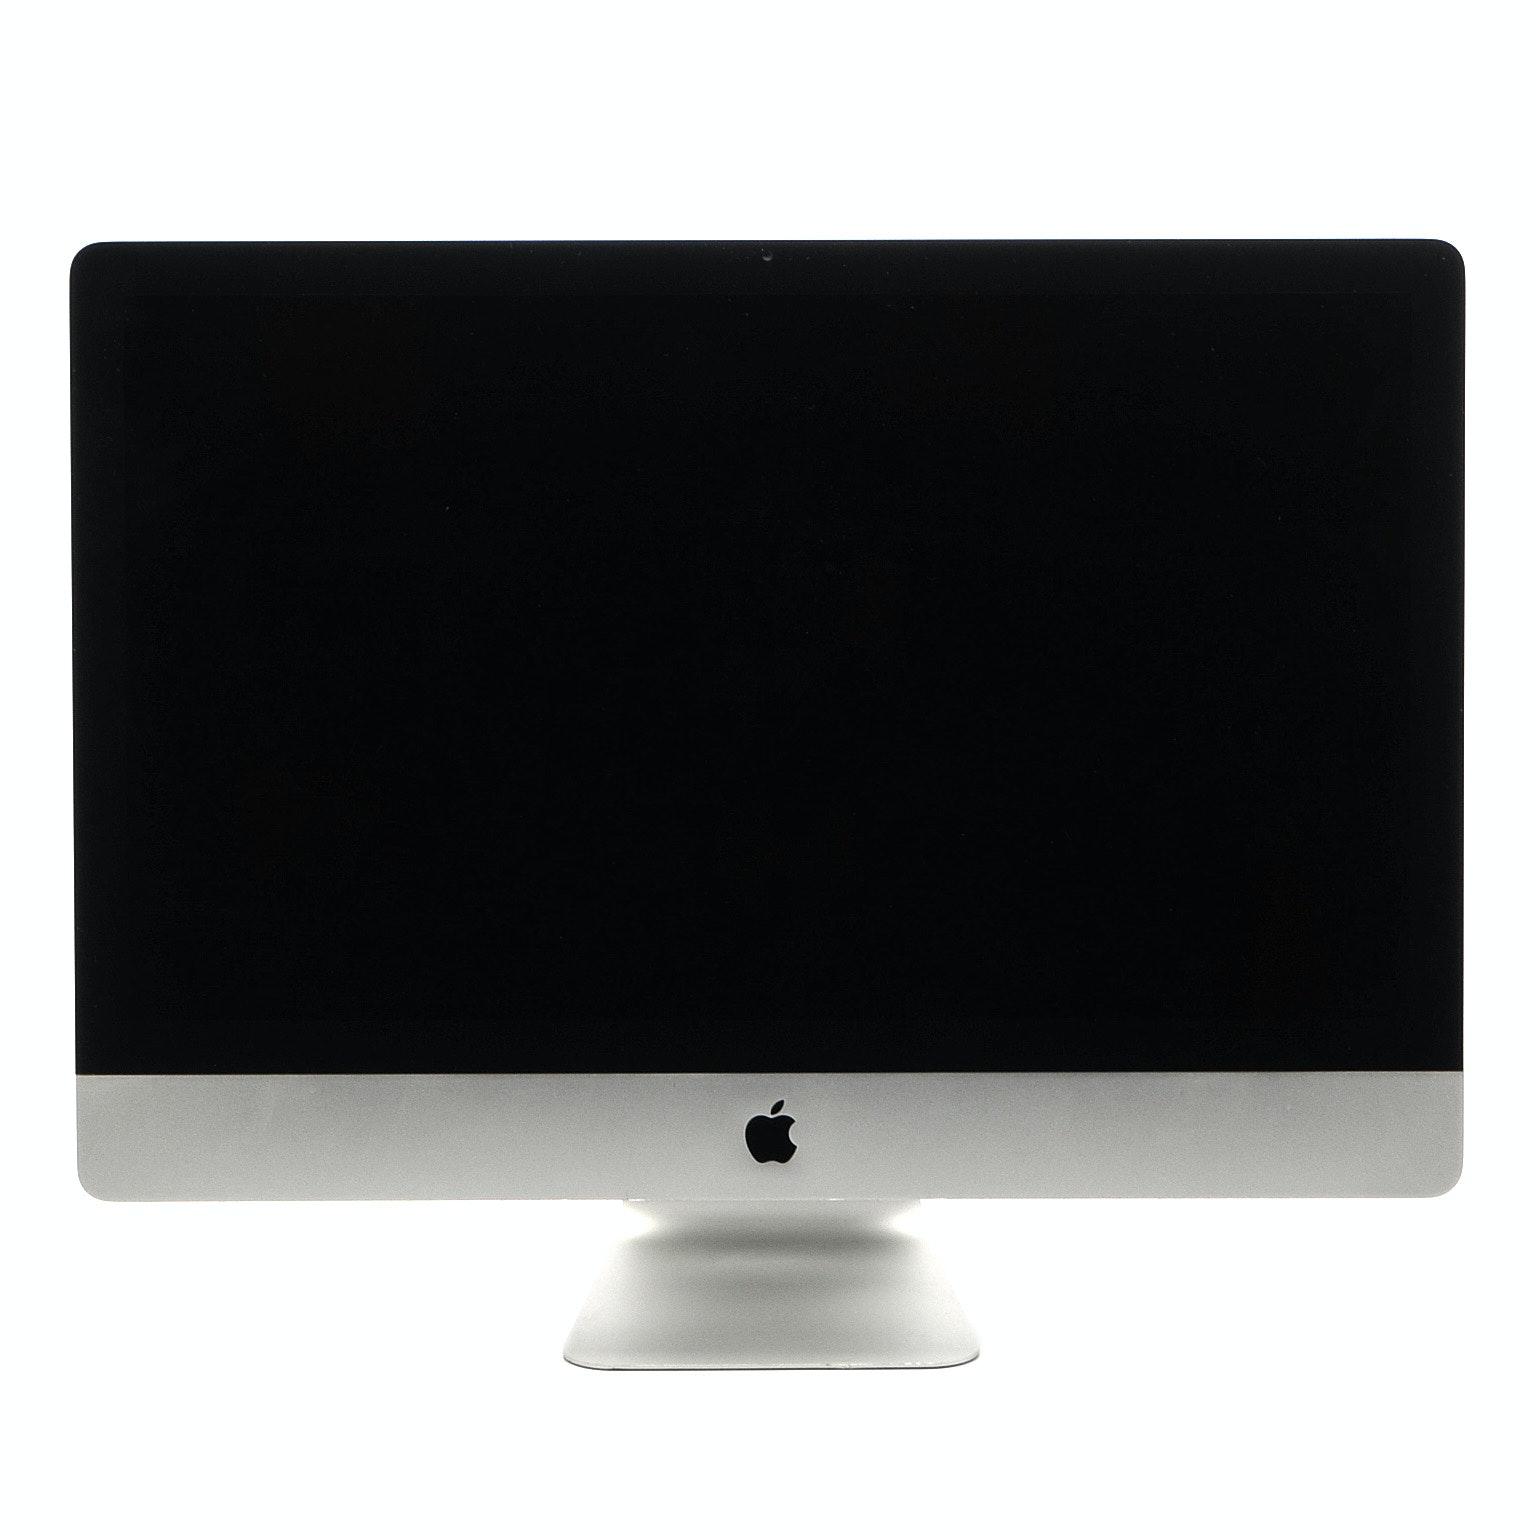 21.5 iMac Desktop